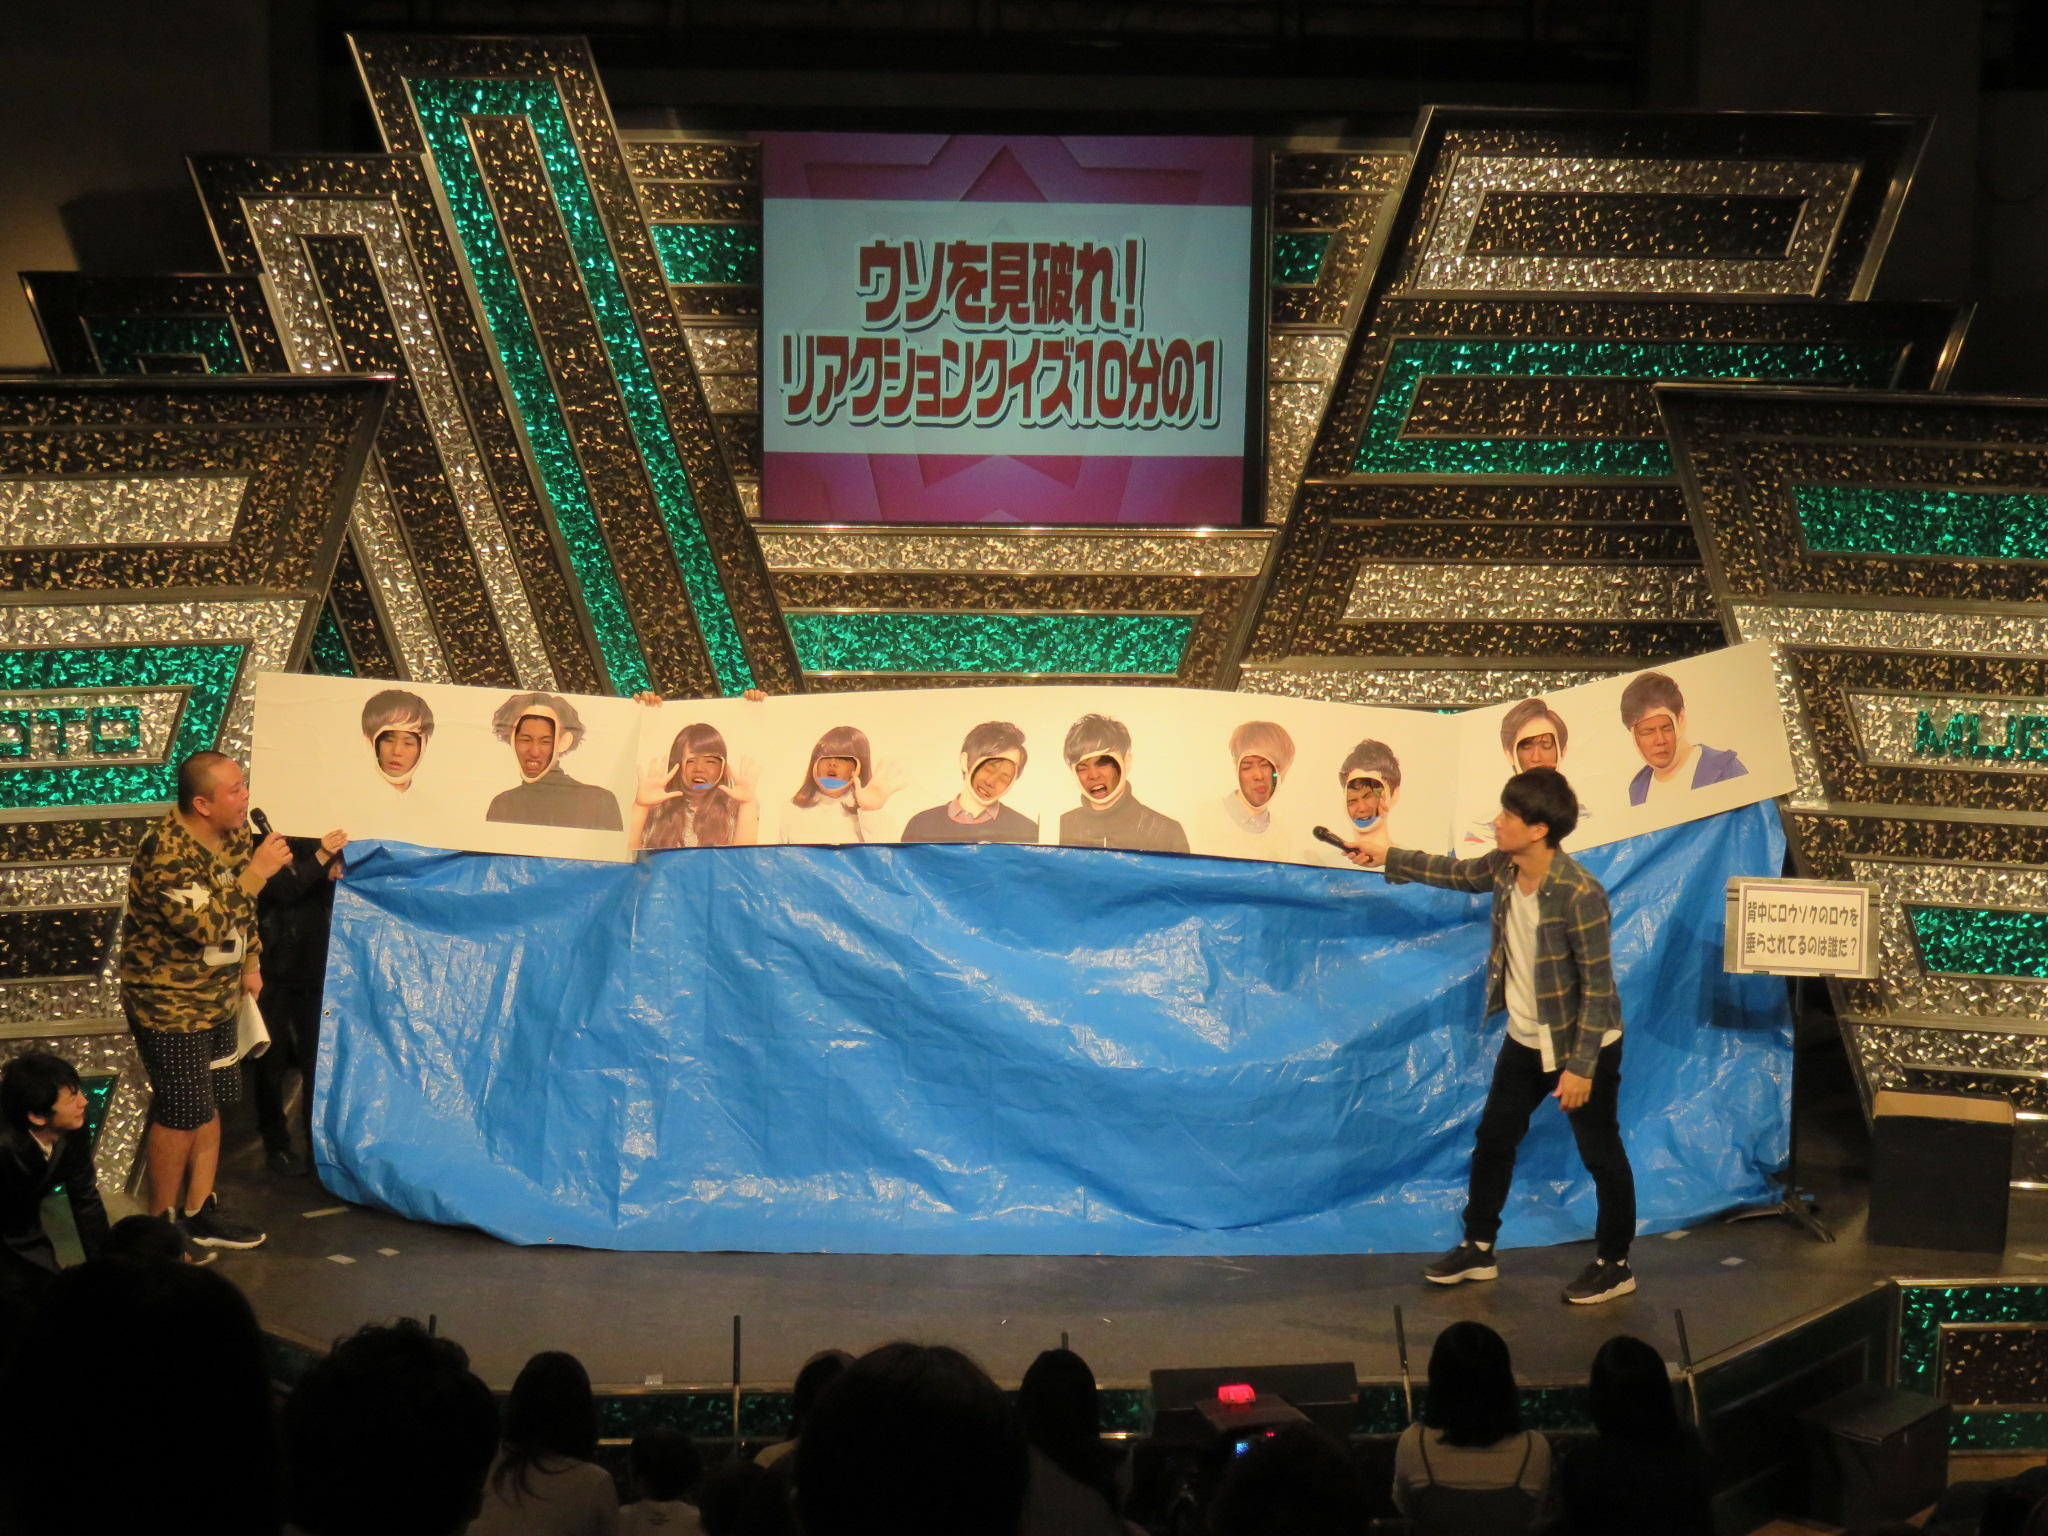 http://news.yoshimoto.co.jp/20160229163436-8c7d20734417301624fff391501aa491472fa855.jpg